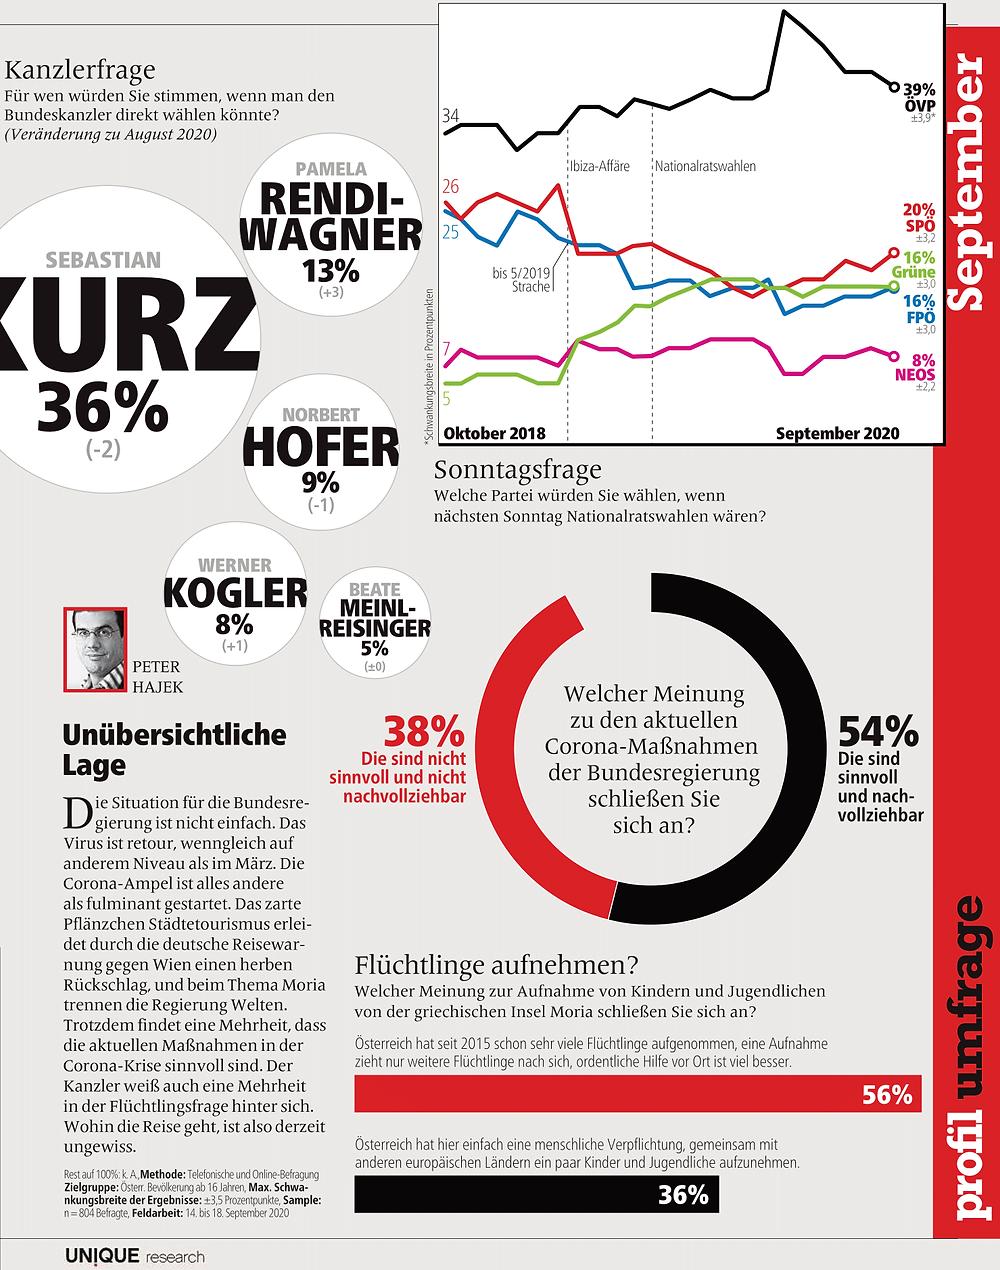 unique research peter hajek josef kalina umfrage politik wahlen waehlertrend profil hochschaetzung sonntagsfrage september print artikel profil 2020